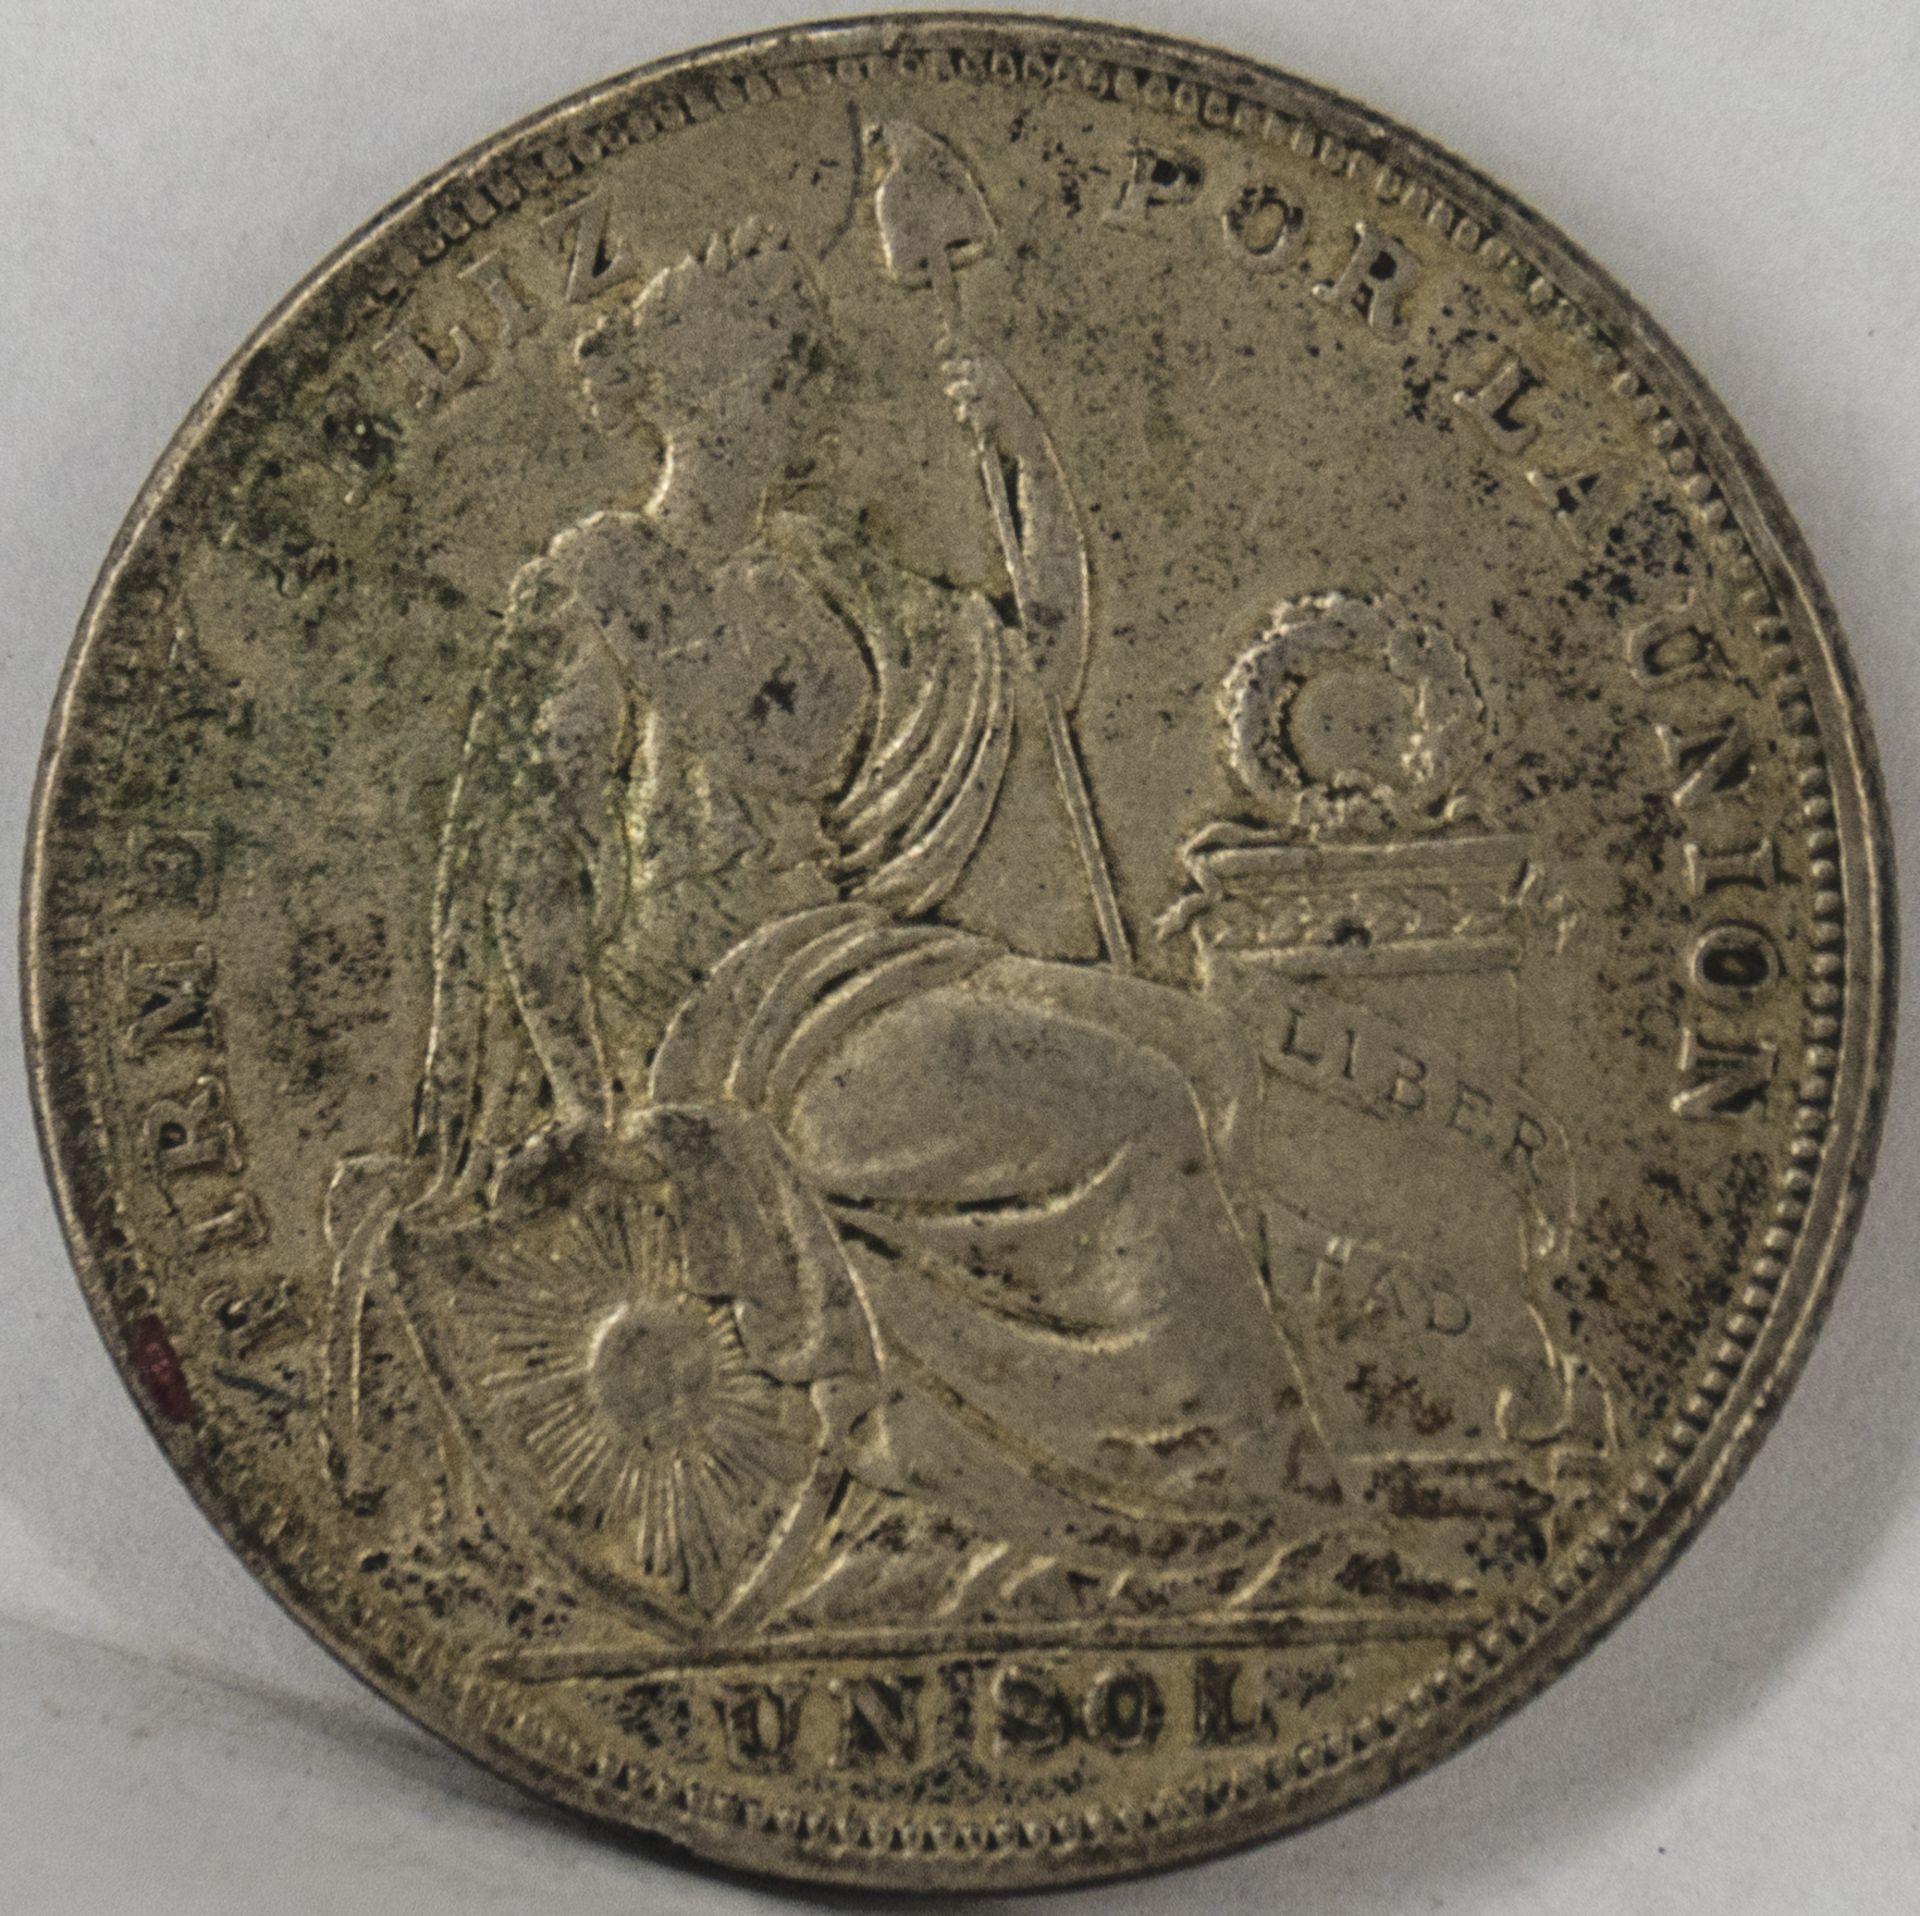 Peru 1924, 1 Sol - Silbermünze, Erhaltung: s.